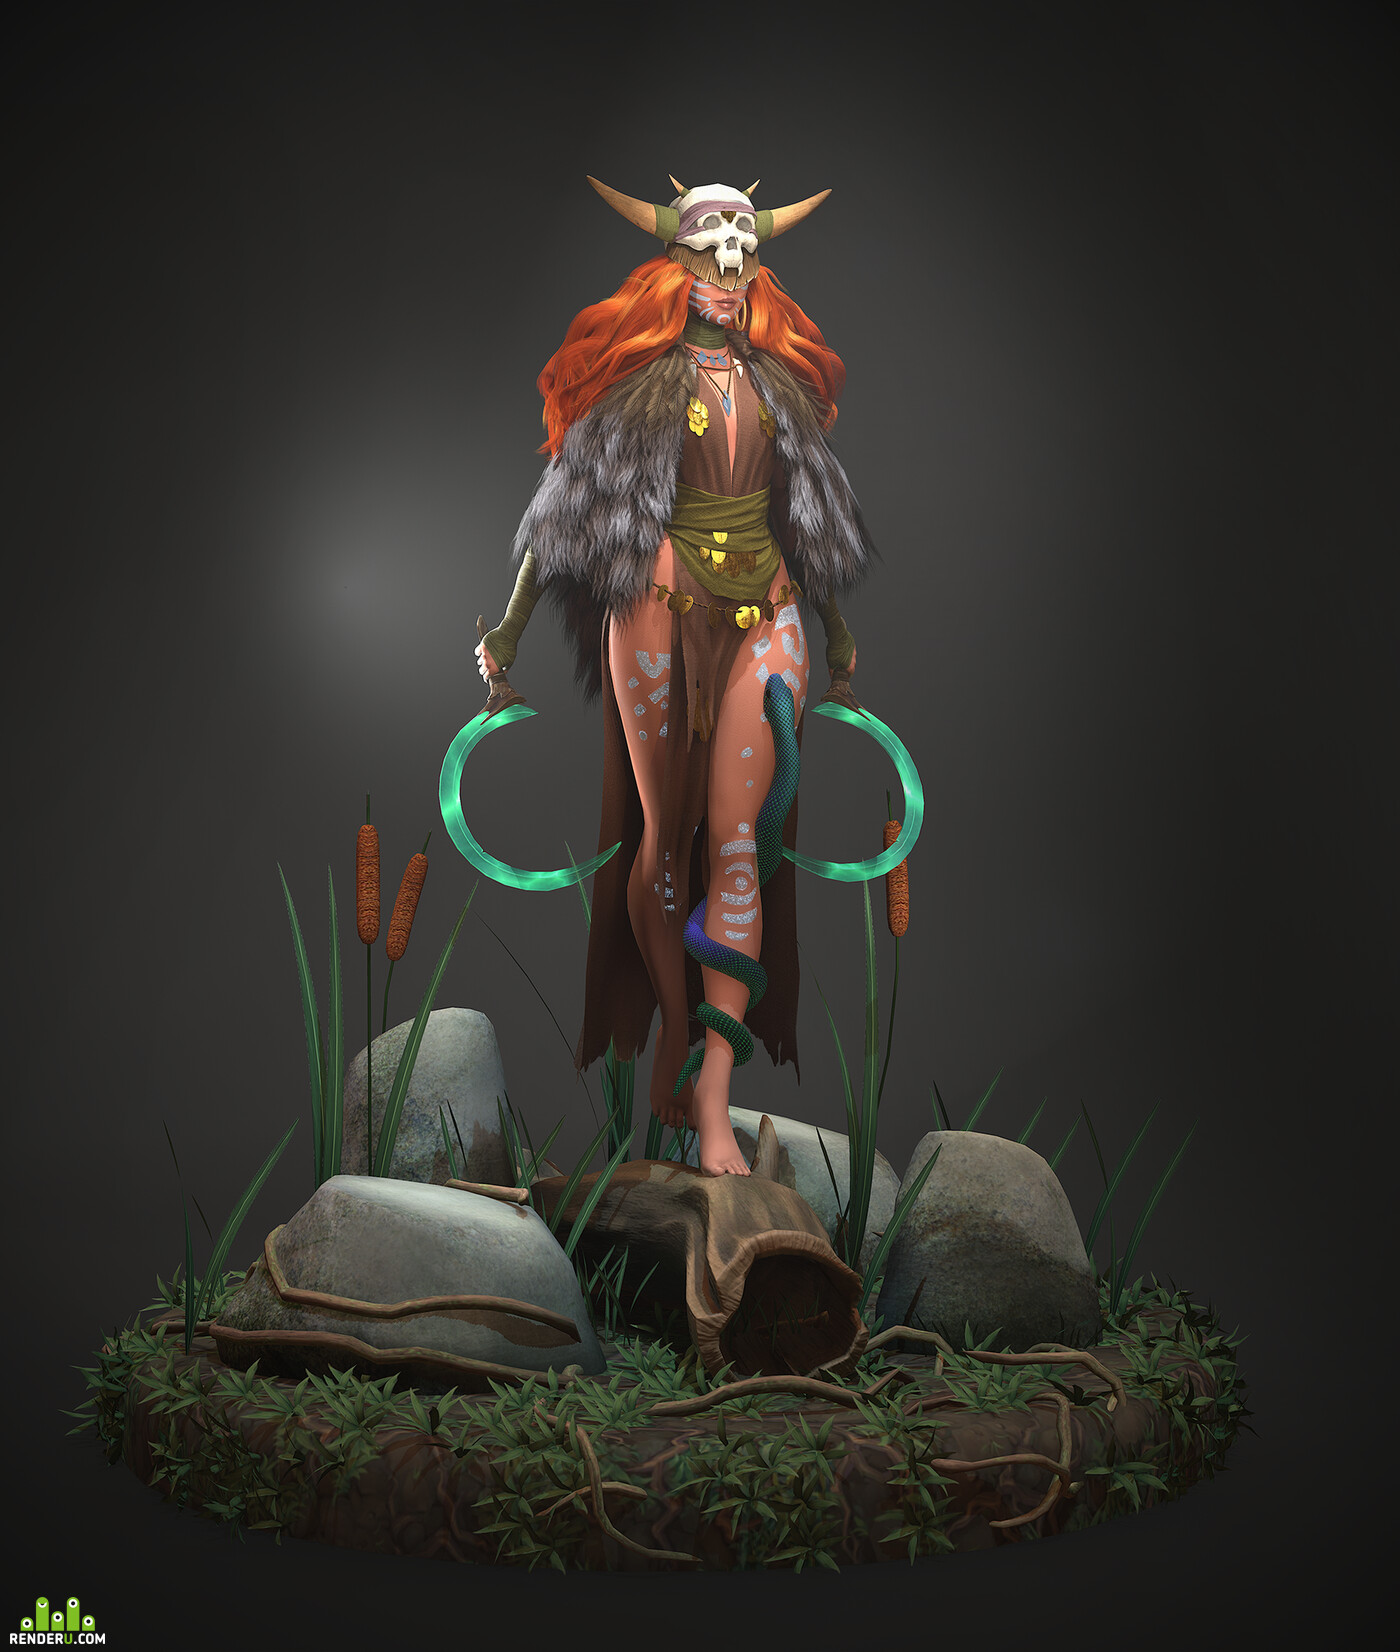 digital sculpting, characterdesign, characterart, Characters